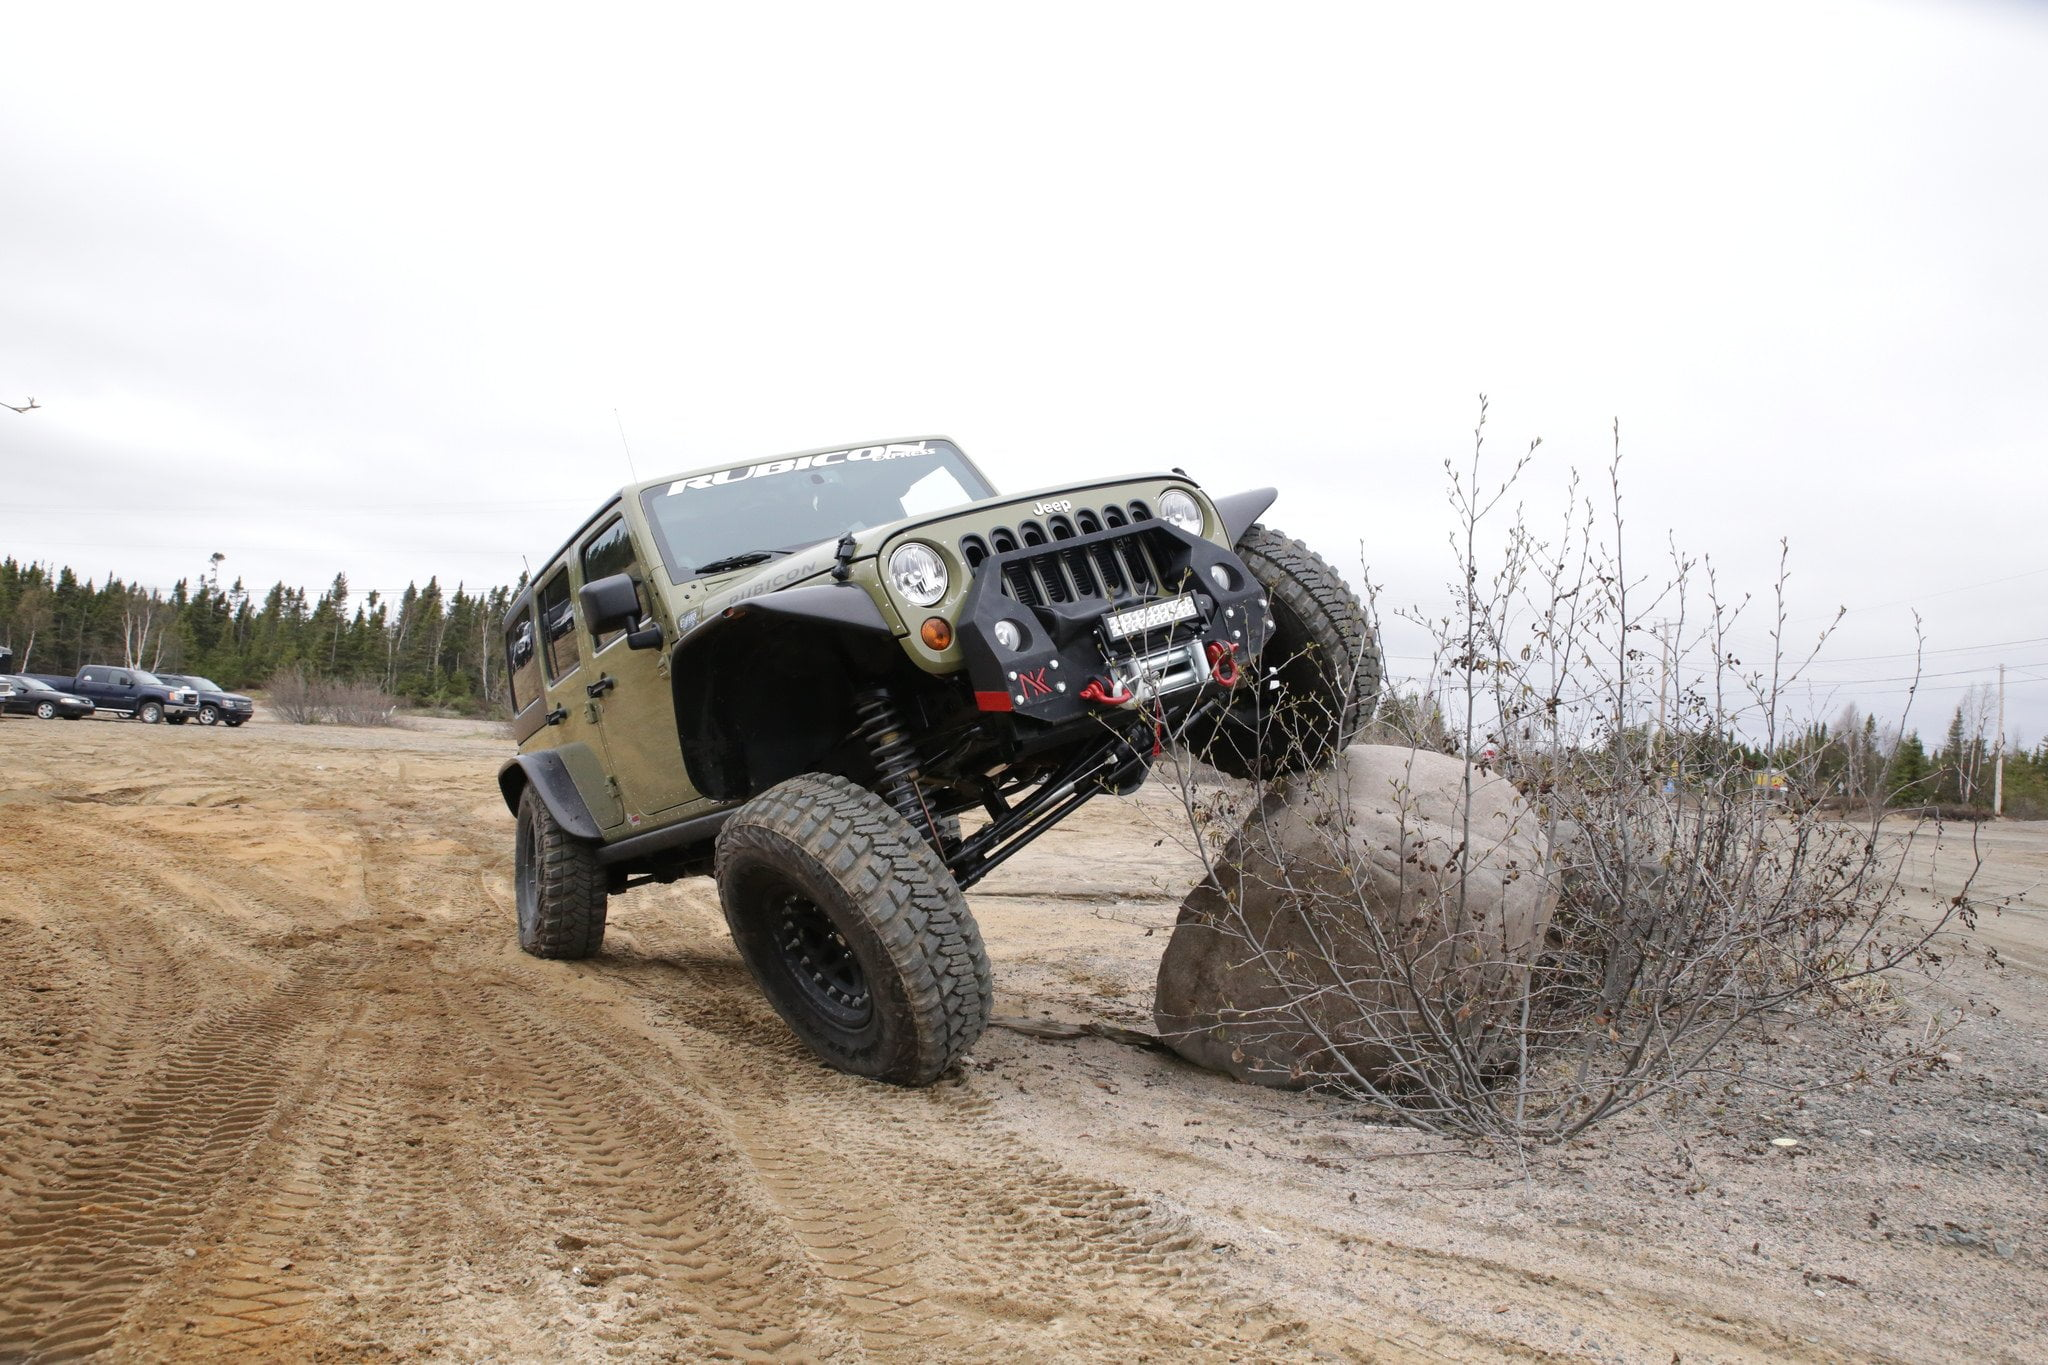 Jeep Wrangler flex